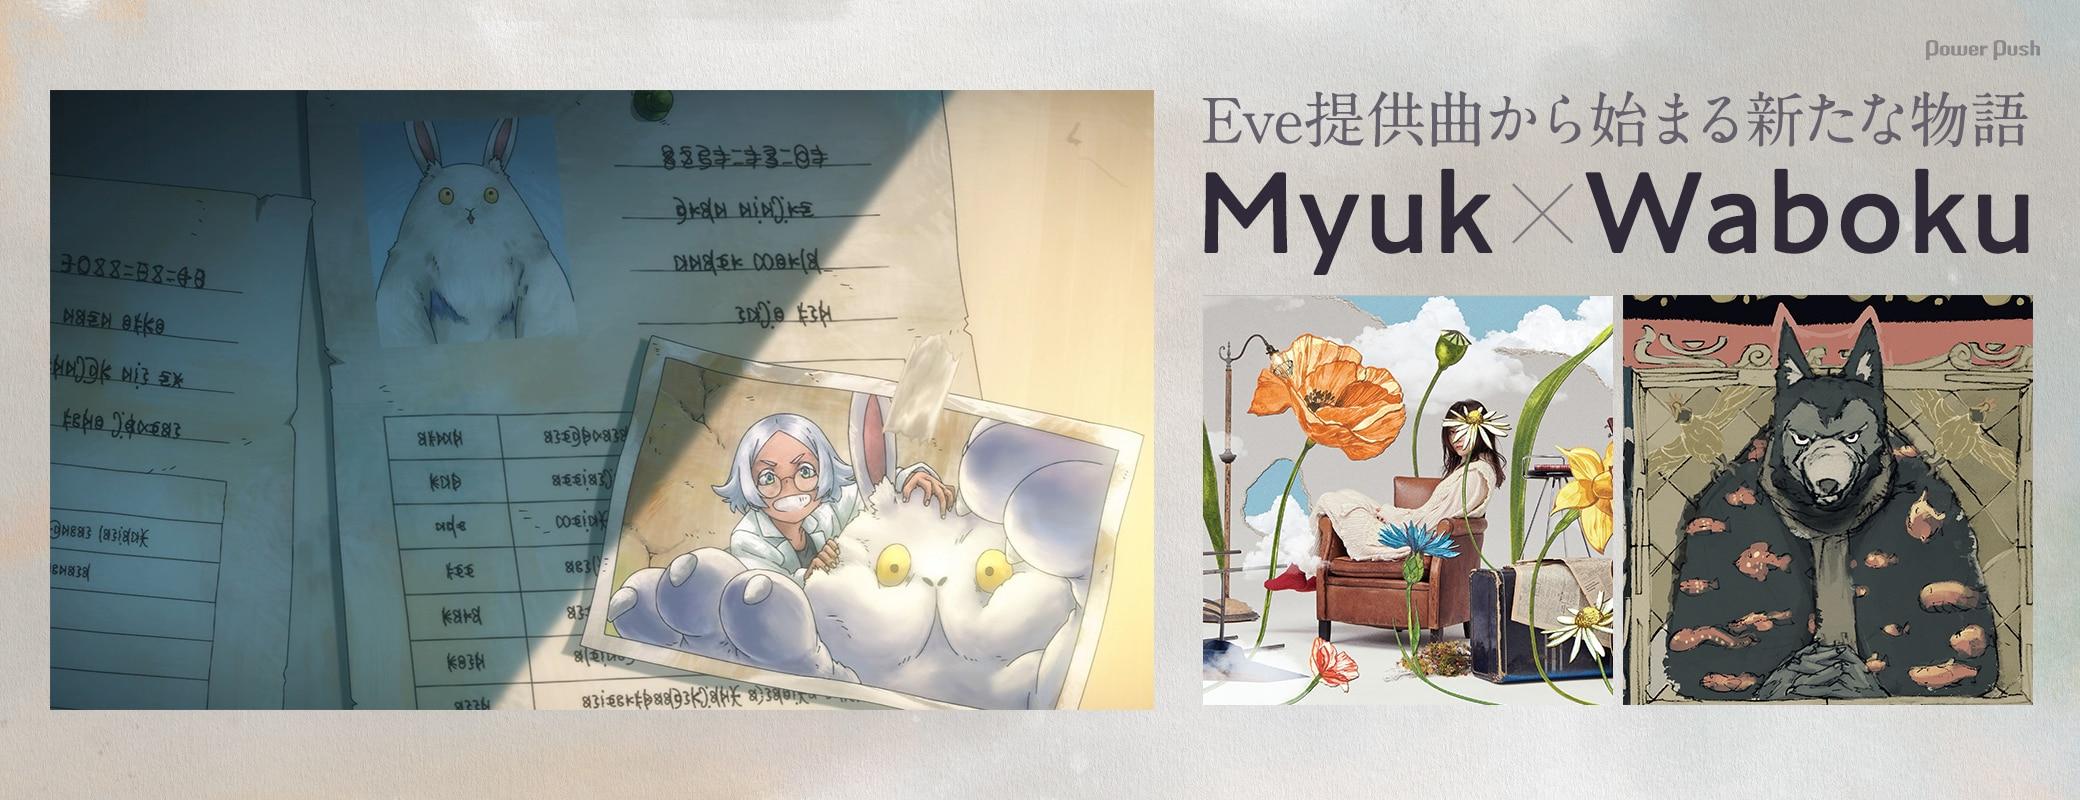 Myuk×Waboku Eve提供曲から始まる新たな物語